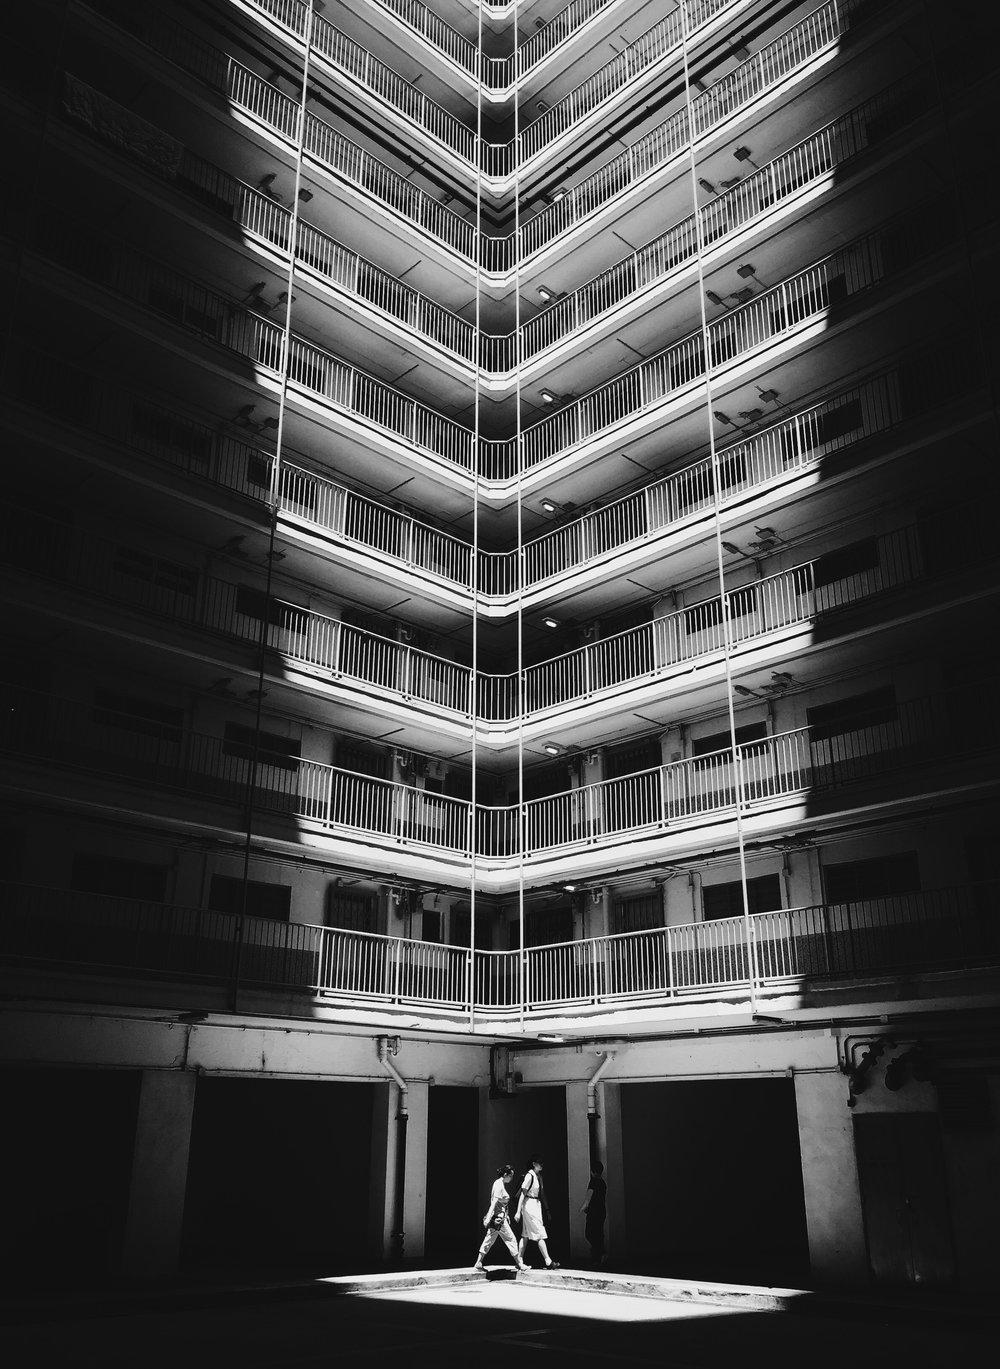 ©Jeremy Cheung - Jeremy以《井底之光》奪得2017年《國家地理會德豐香港攝影大賽》手機組的季軍。